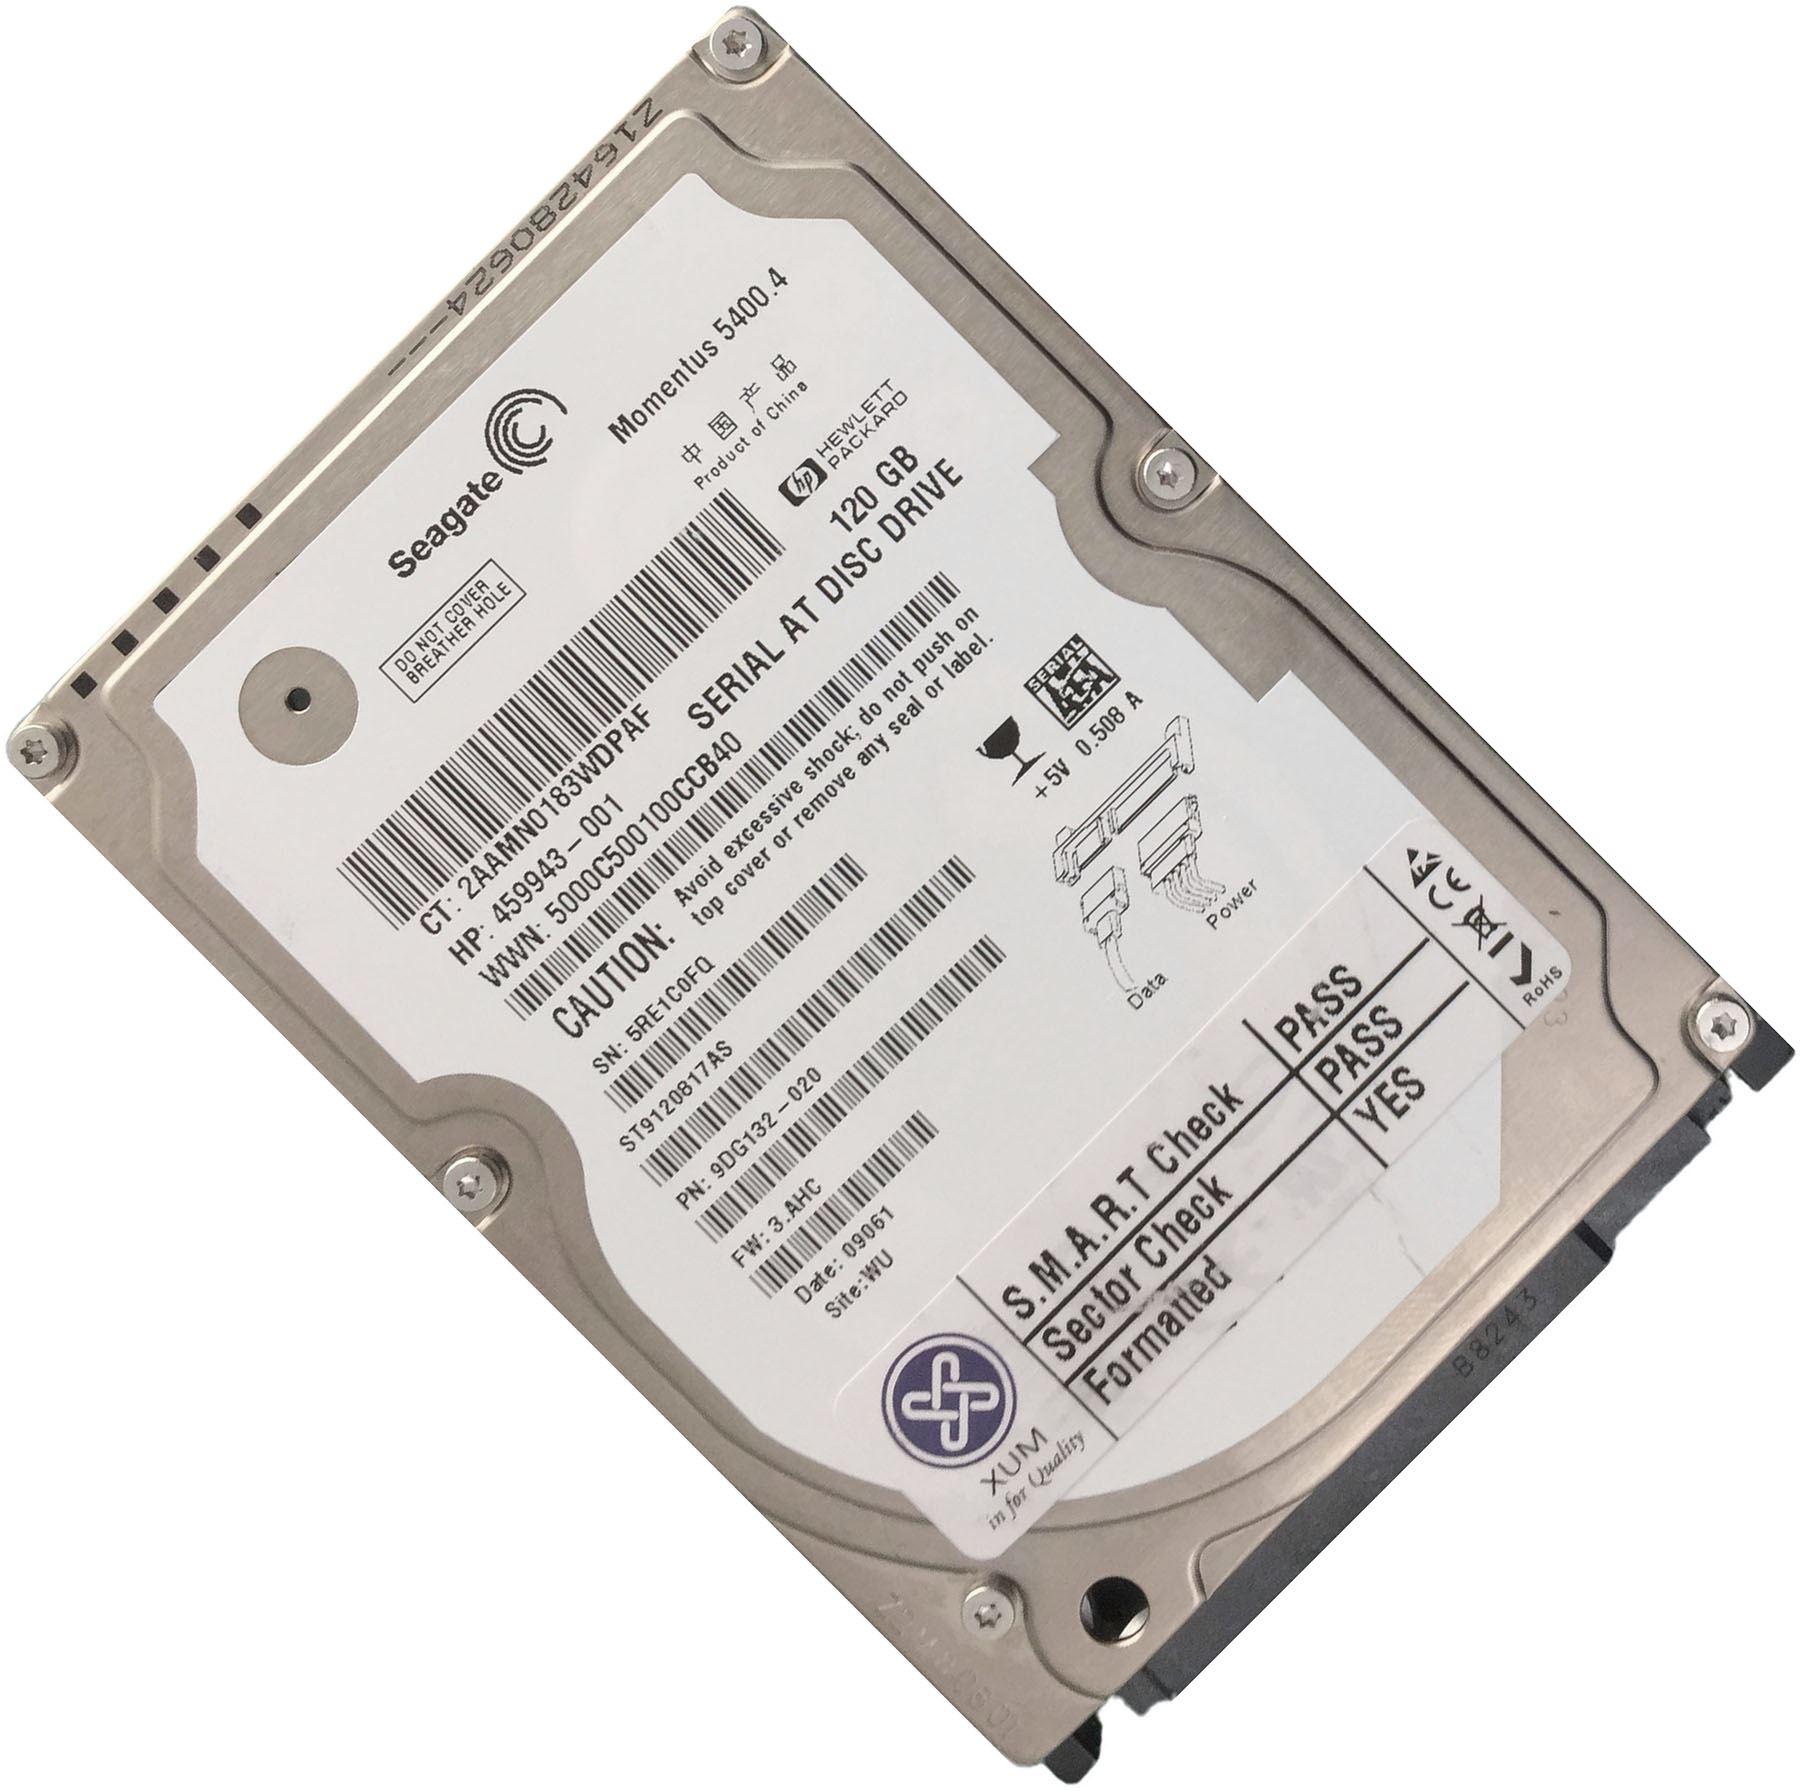 20GB Internal HDD Hard Drive Disk For Microsoft Xbox 360